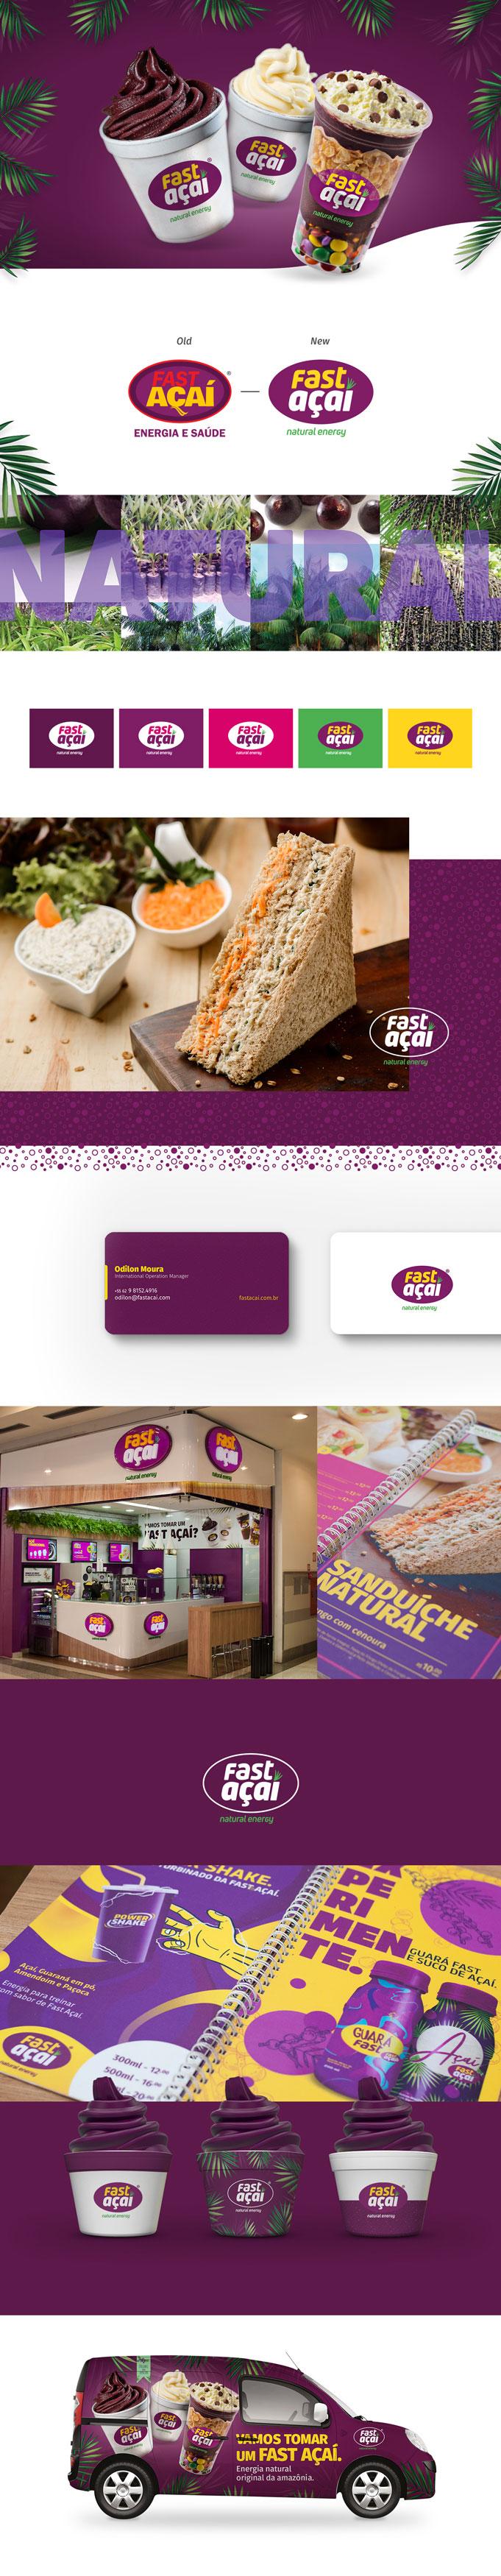 Fast Açaí Rebranding